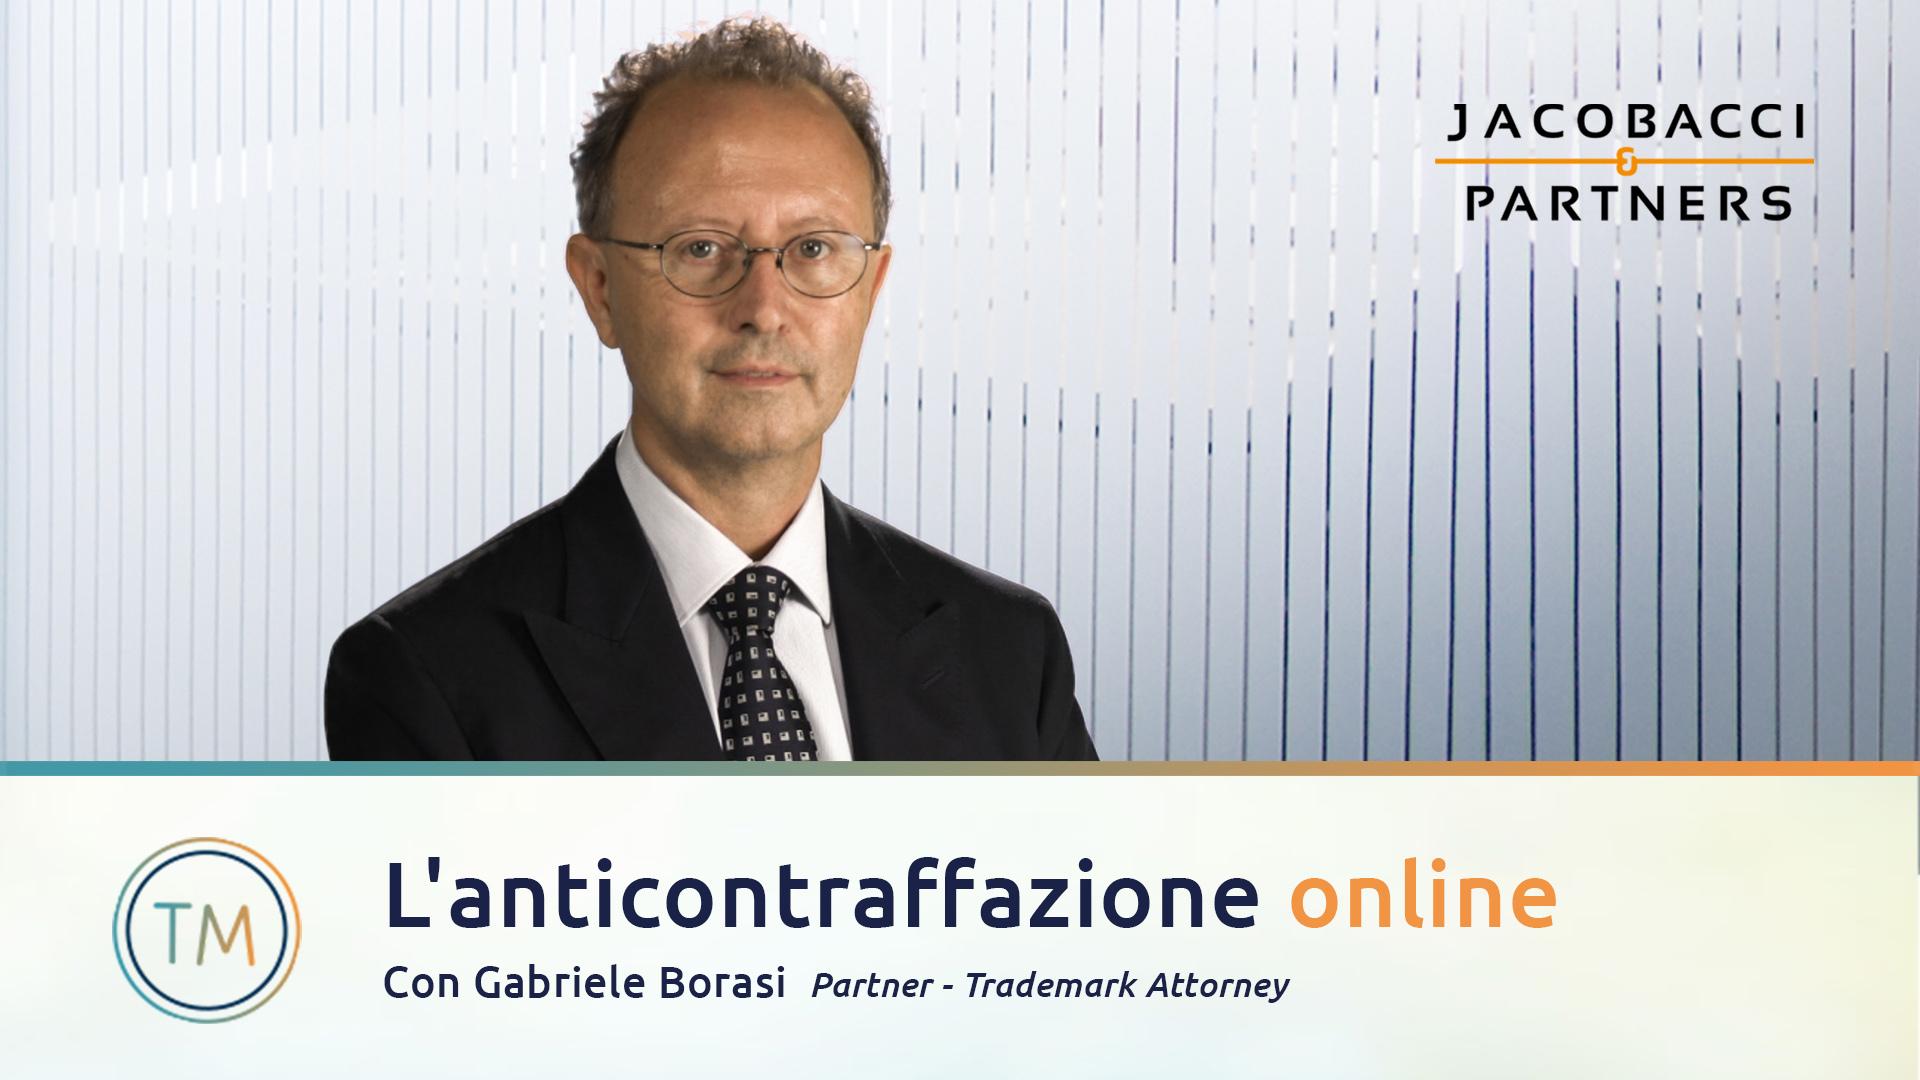 JACOBACCI_VIDEO_02_Gabriele Borasi